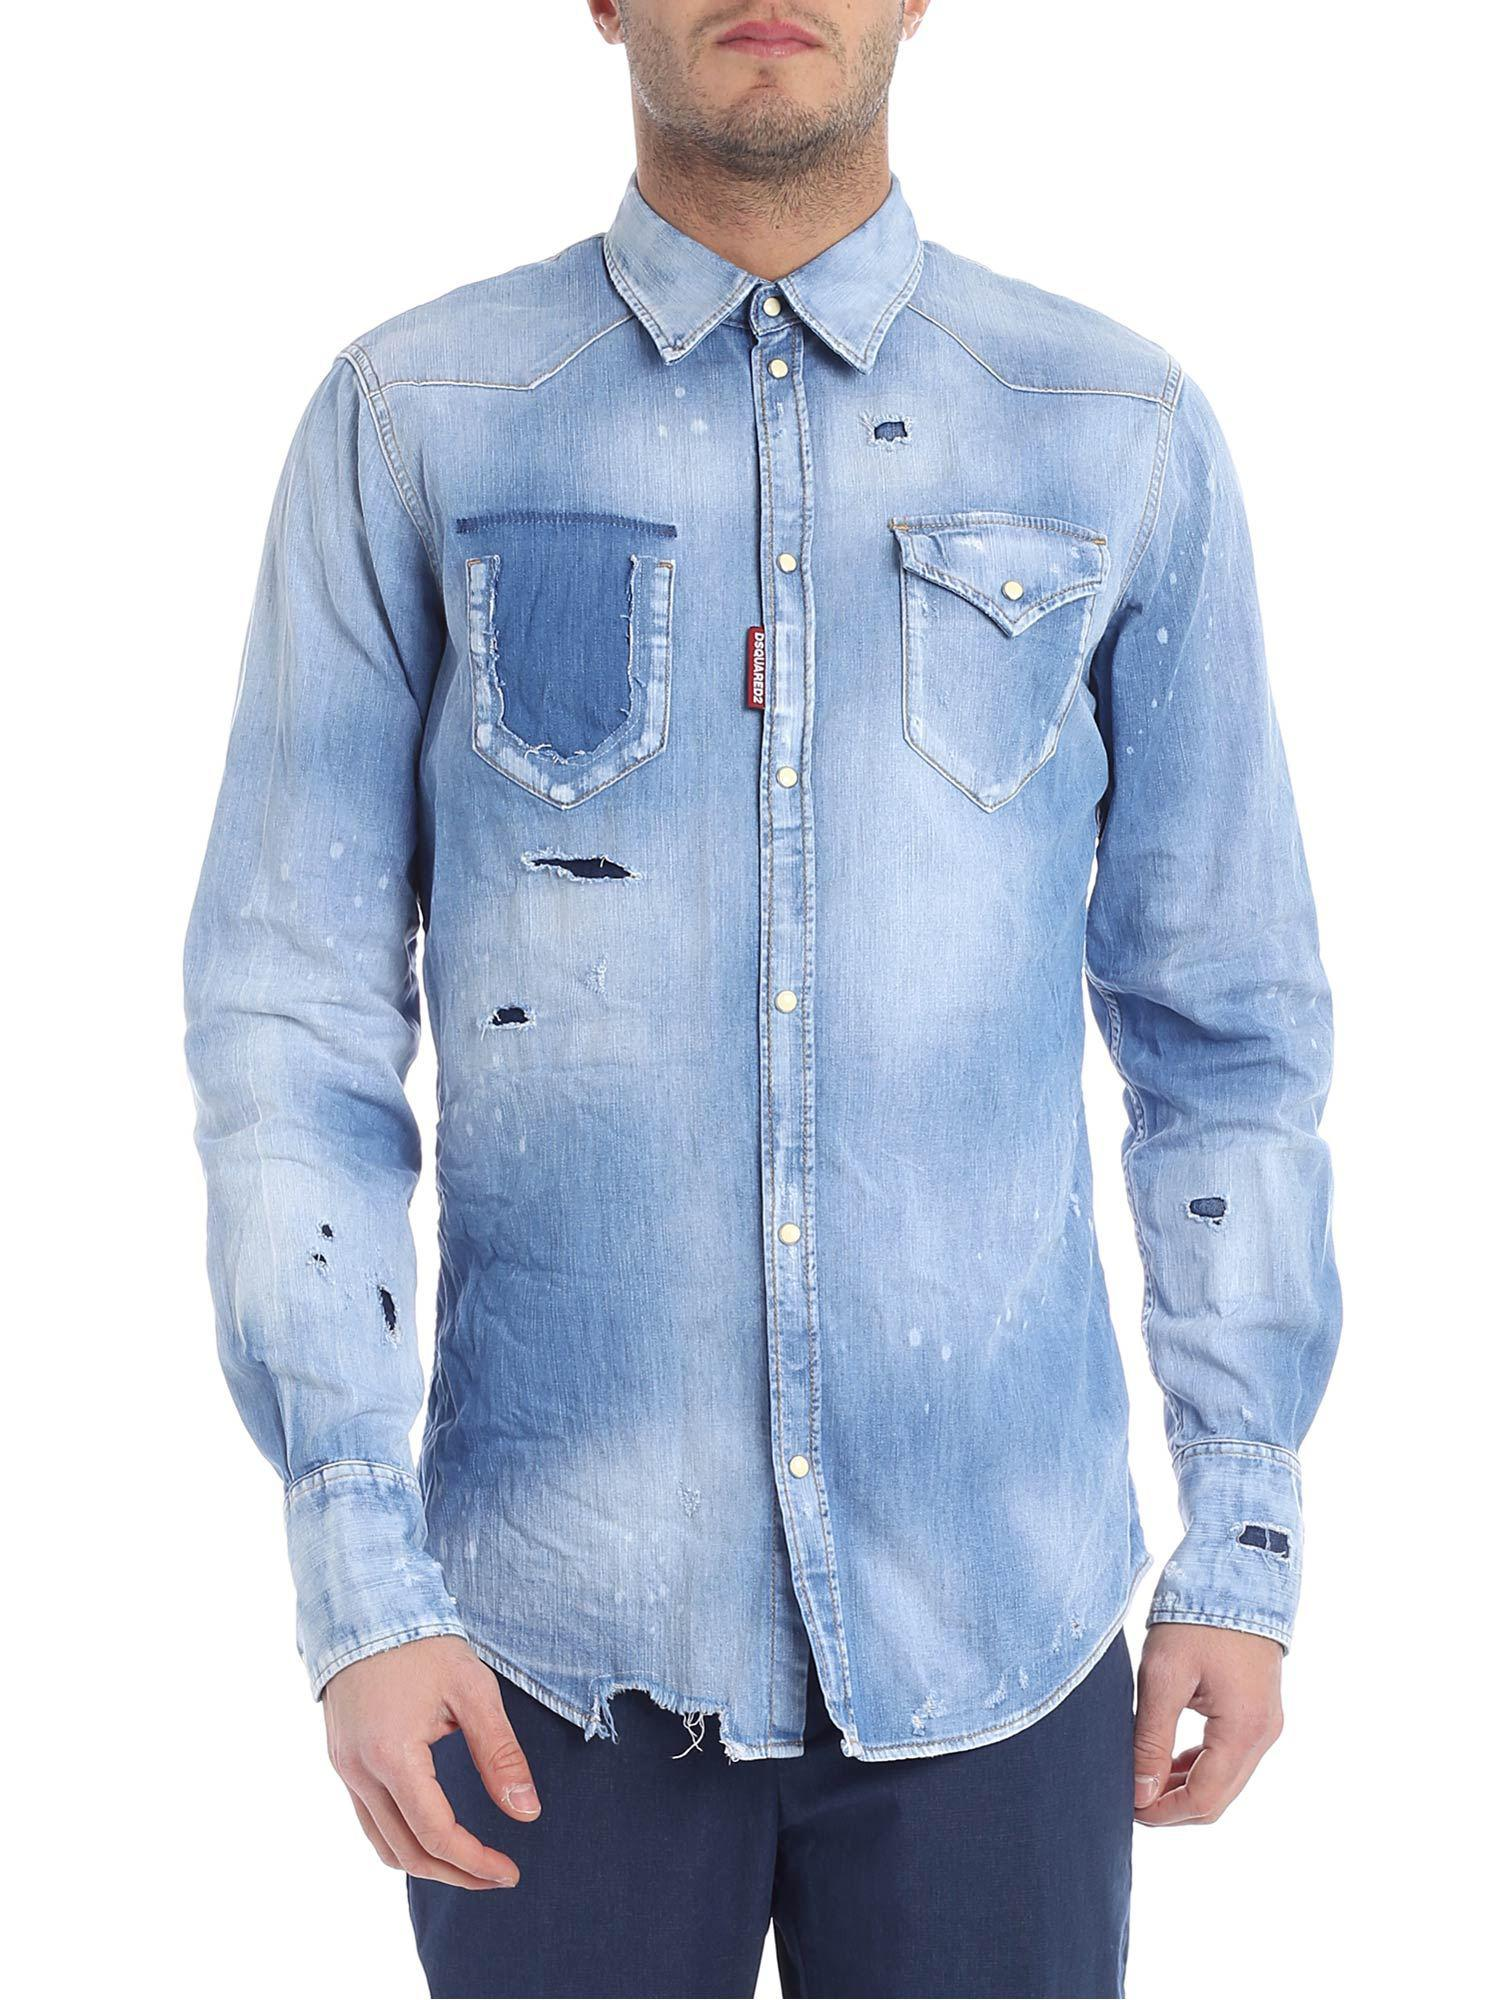 b0ca0f5eef Lyst - DSquared² Destroyed Light Blue Denim Shirt in Blue for Men